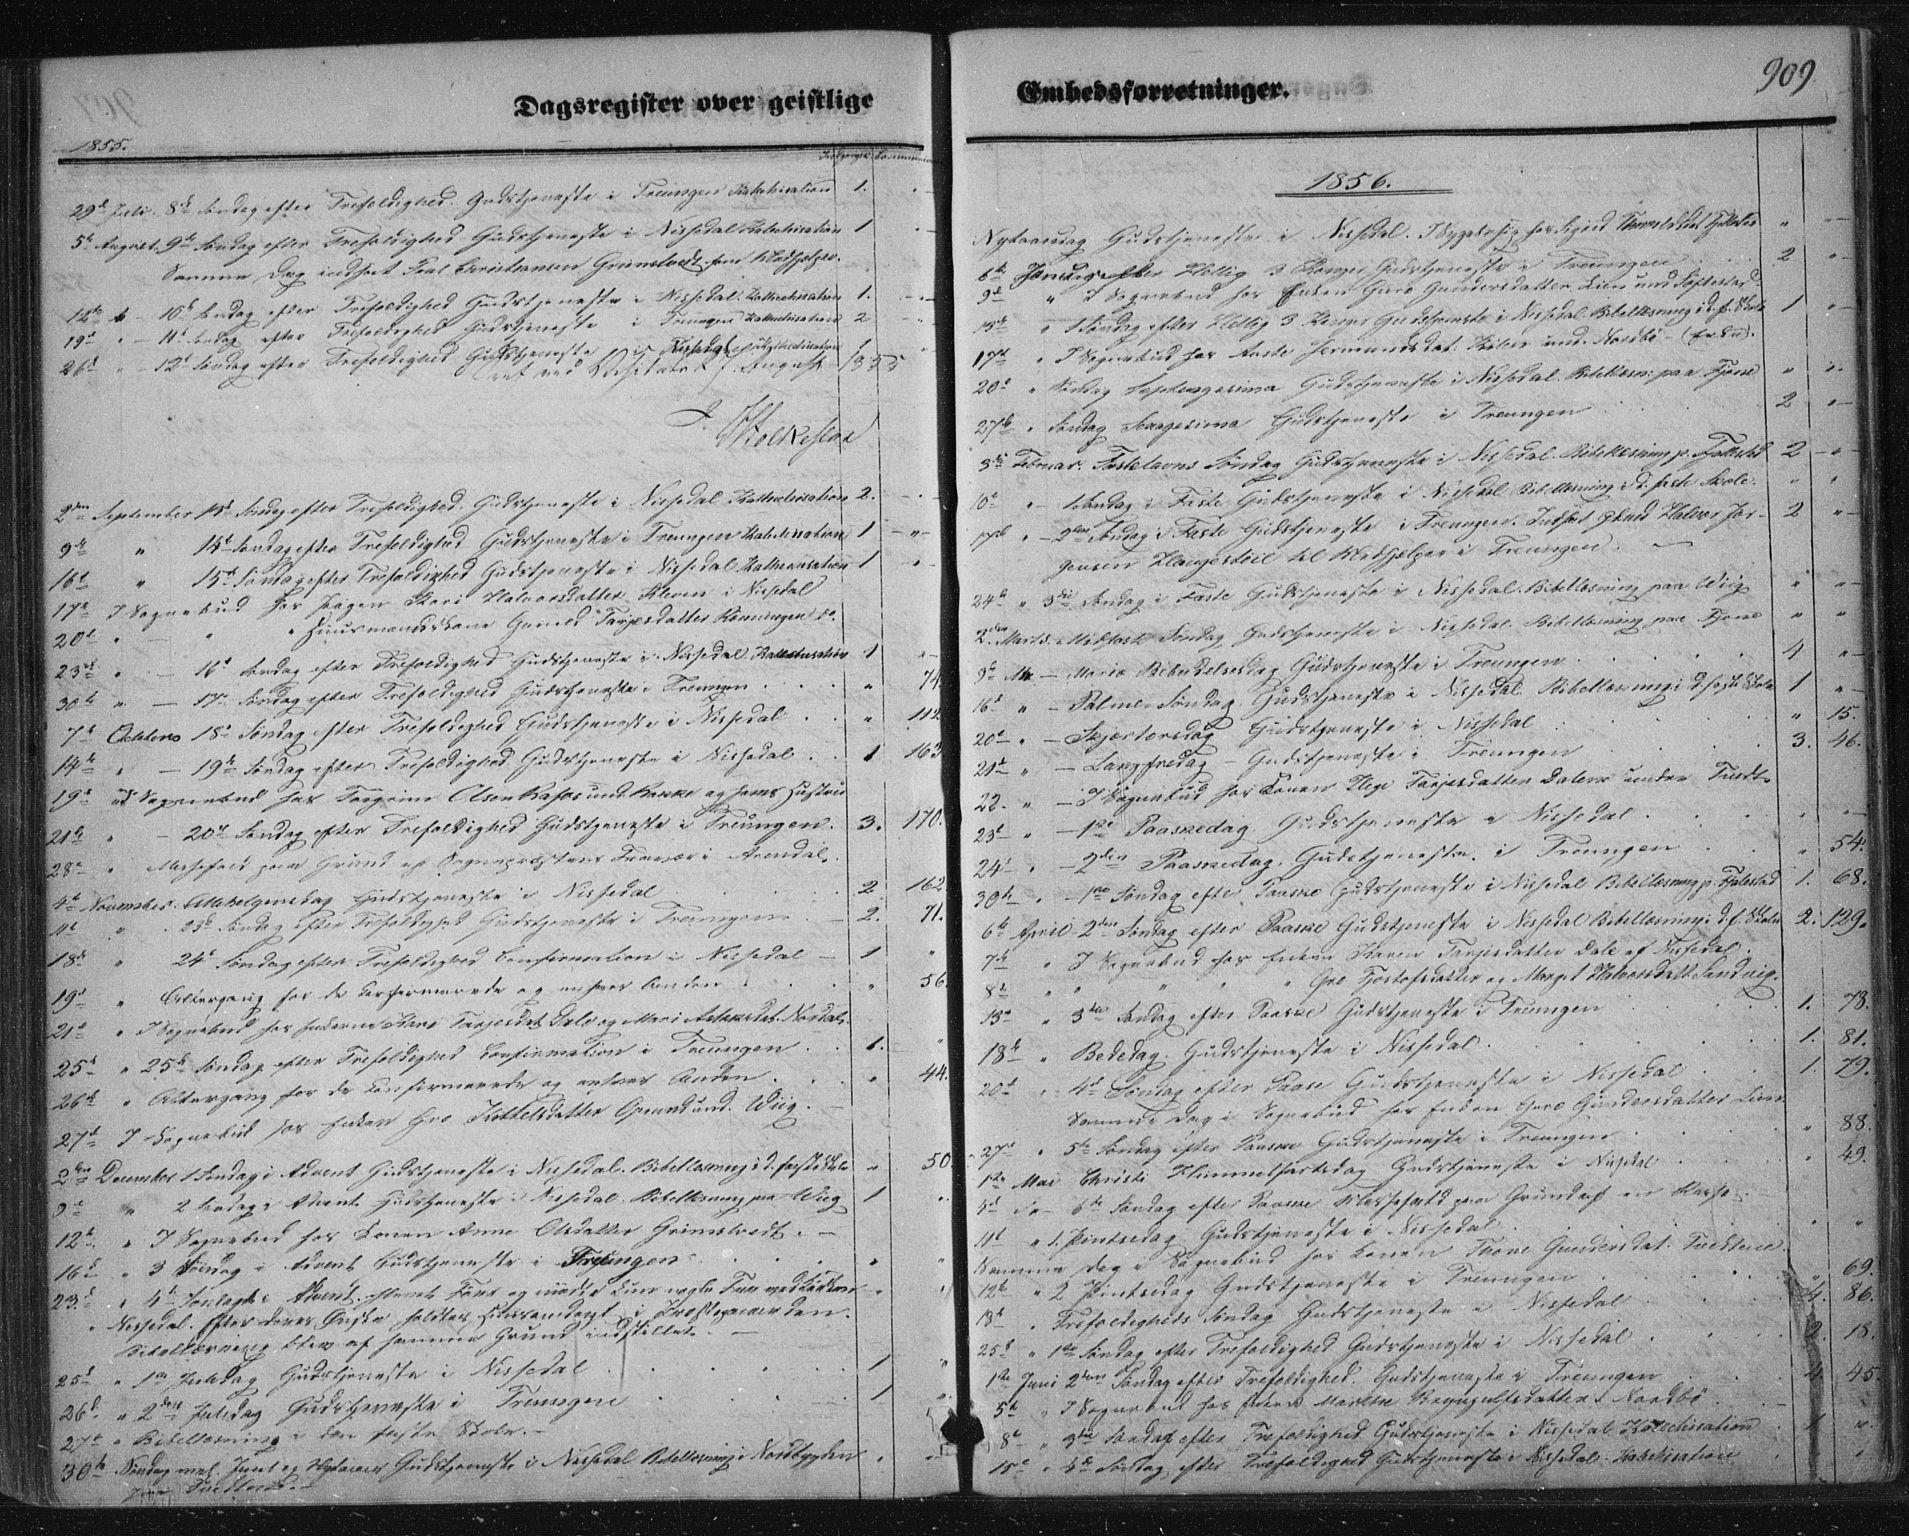 SAKO, Nissedal kirkebøker, F/Fa/L0003: Ministerialbok nr. I 3, 1846-1870, s. 908-909